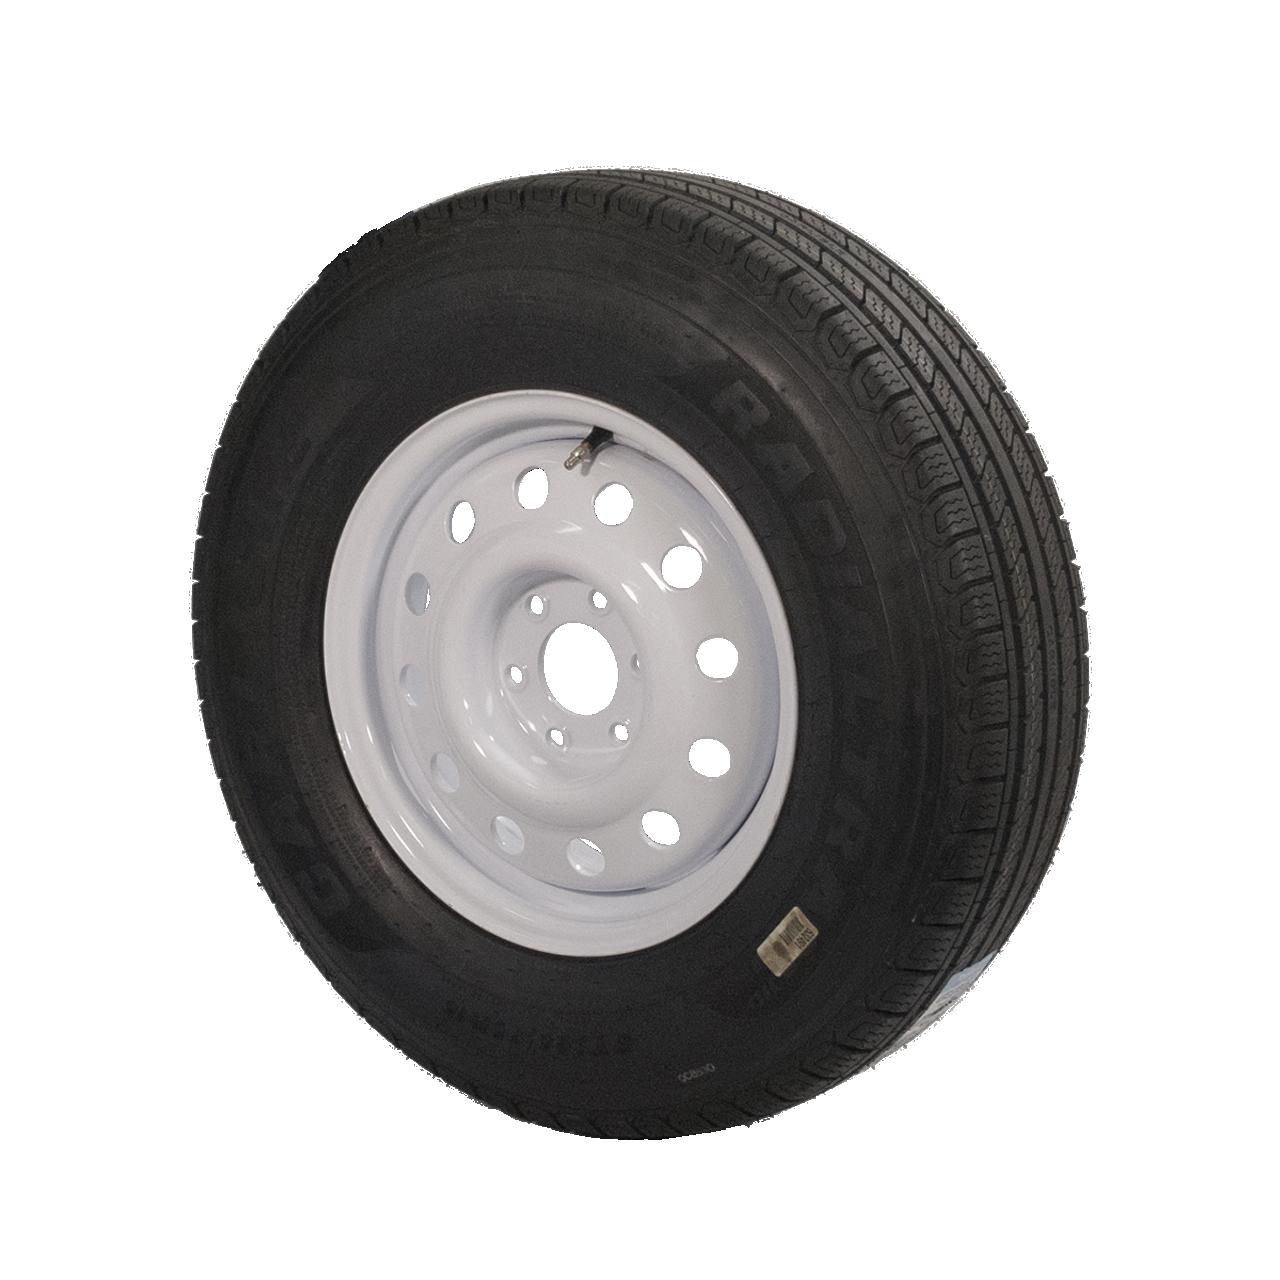 6176 --- Croft Auto Transport Wheel and Tire